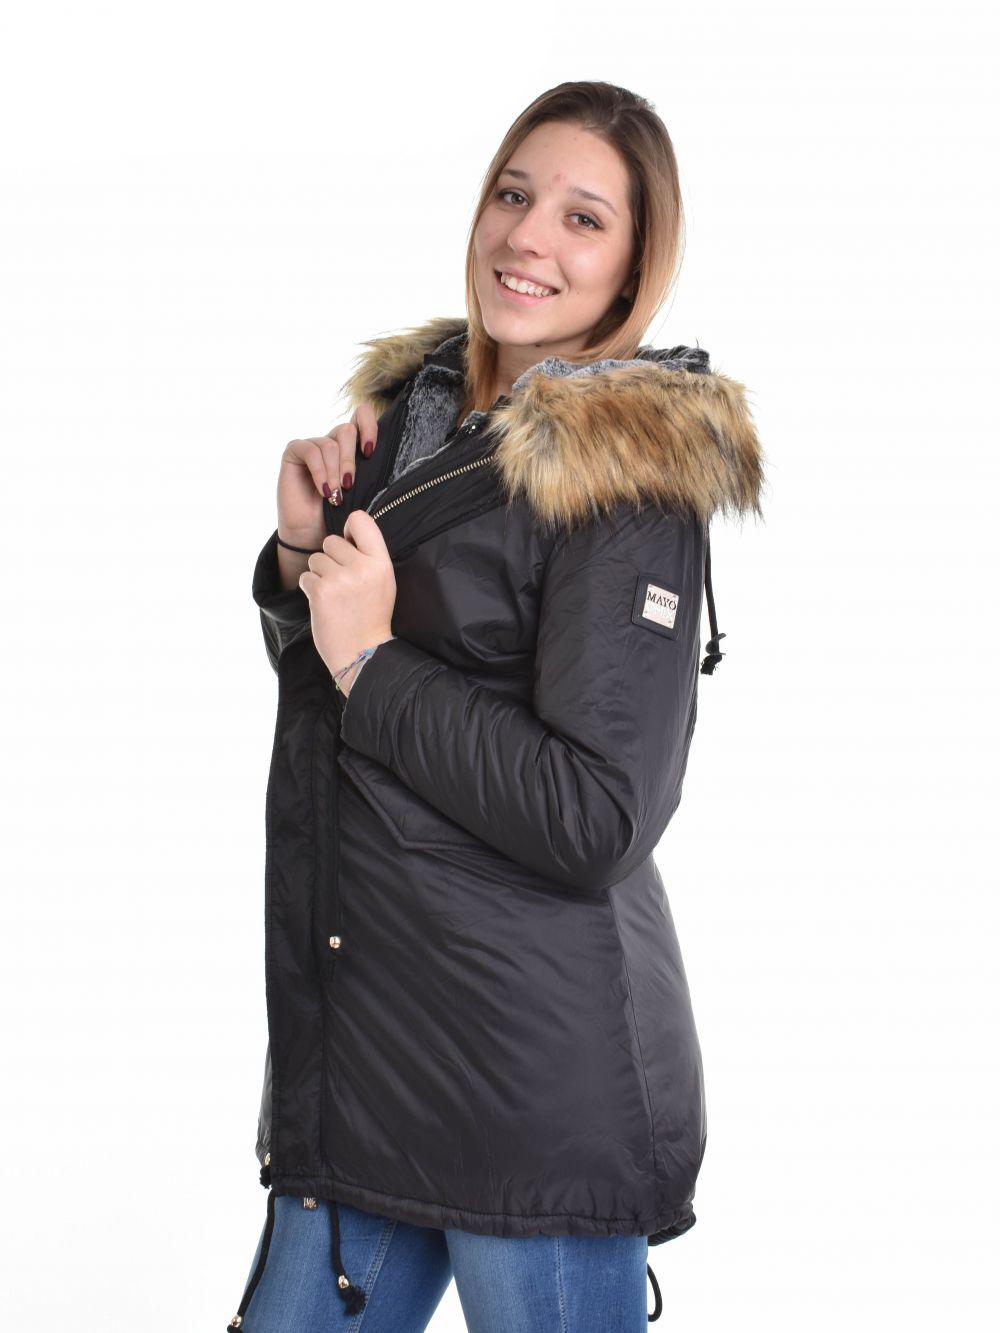 6324d09332 Akciós | Mayo Chix női kabát NESTIE | Markasbolt.hu Hivatalos Mayo ...